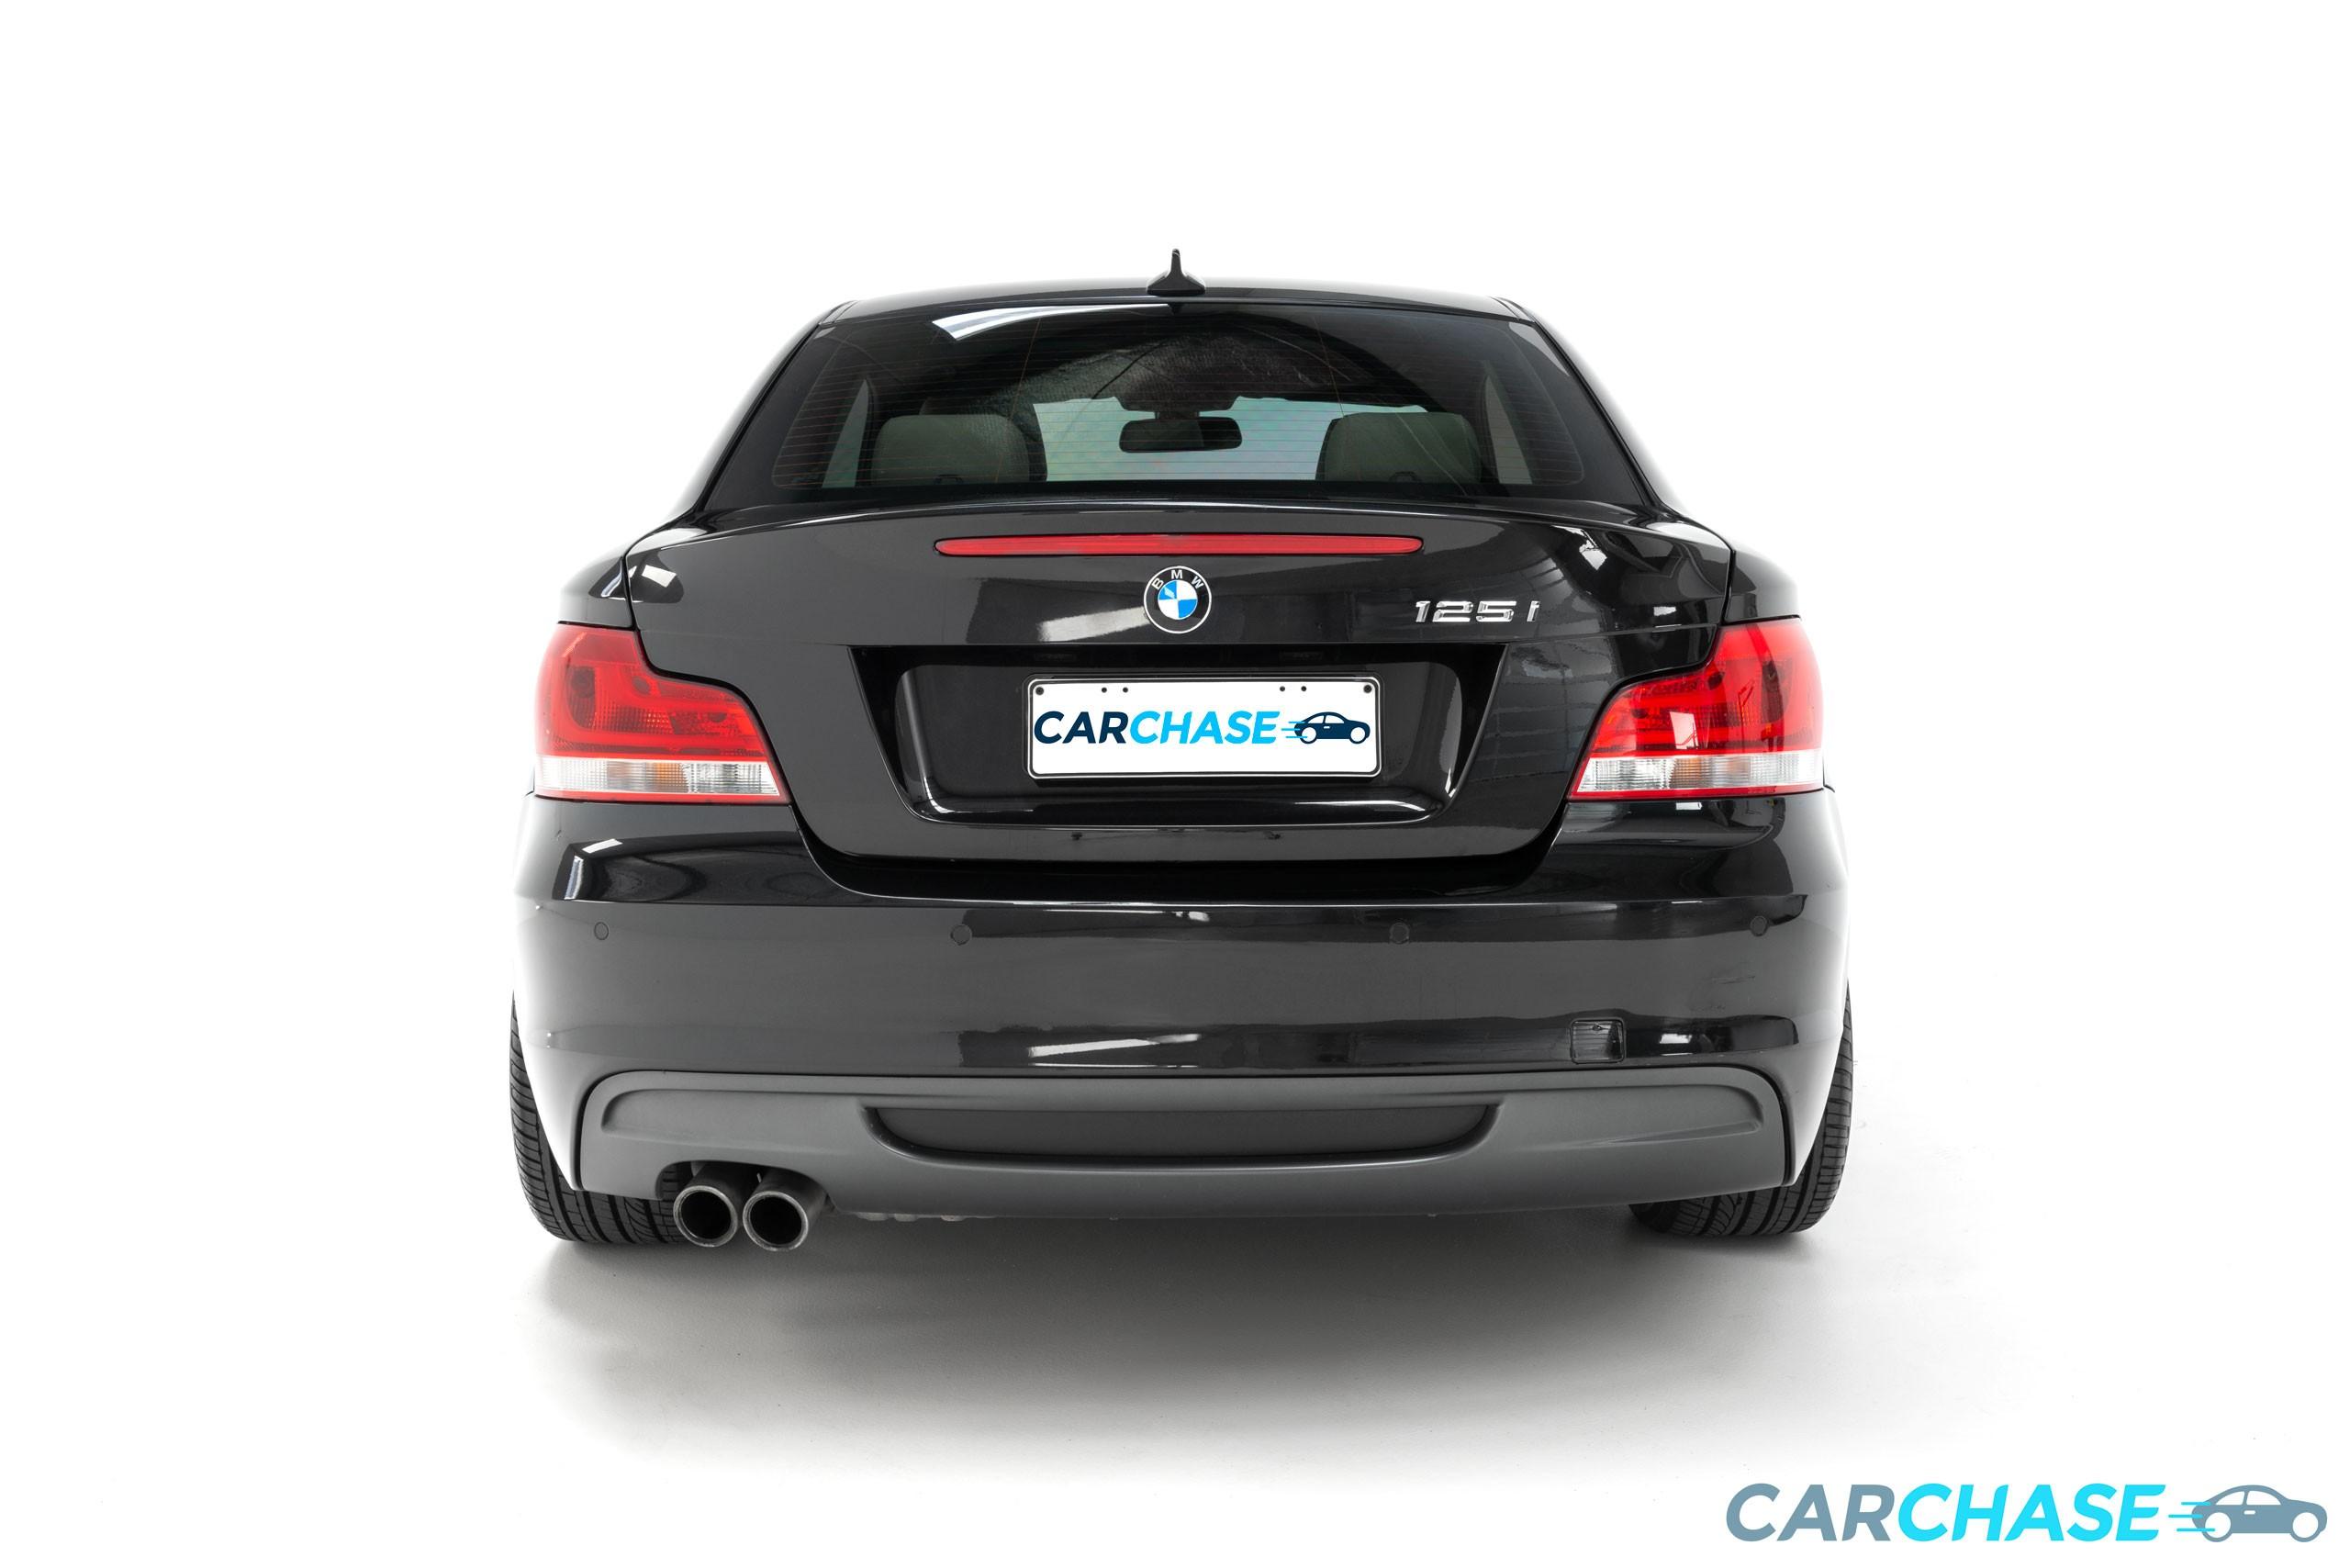 Image of rear profile of 2011 BMW 125i